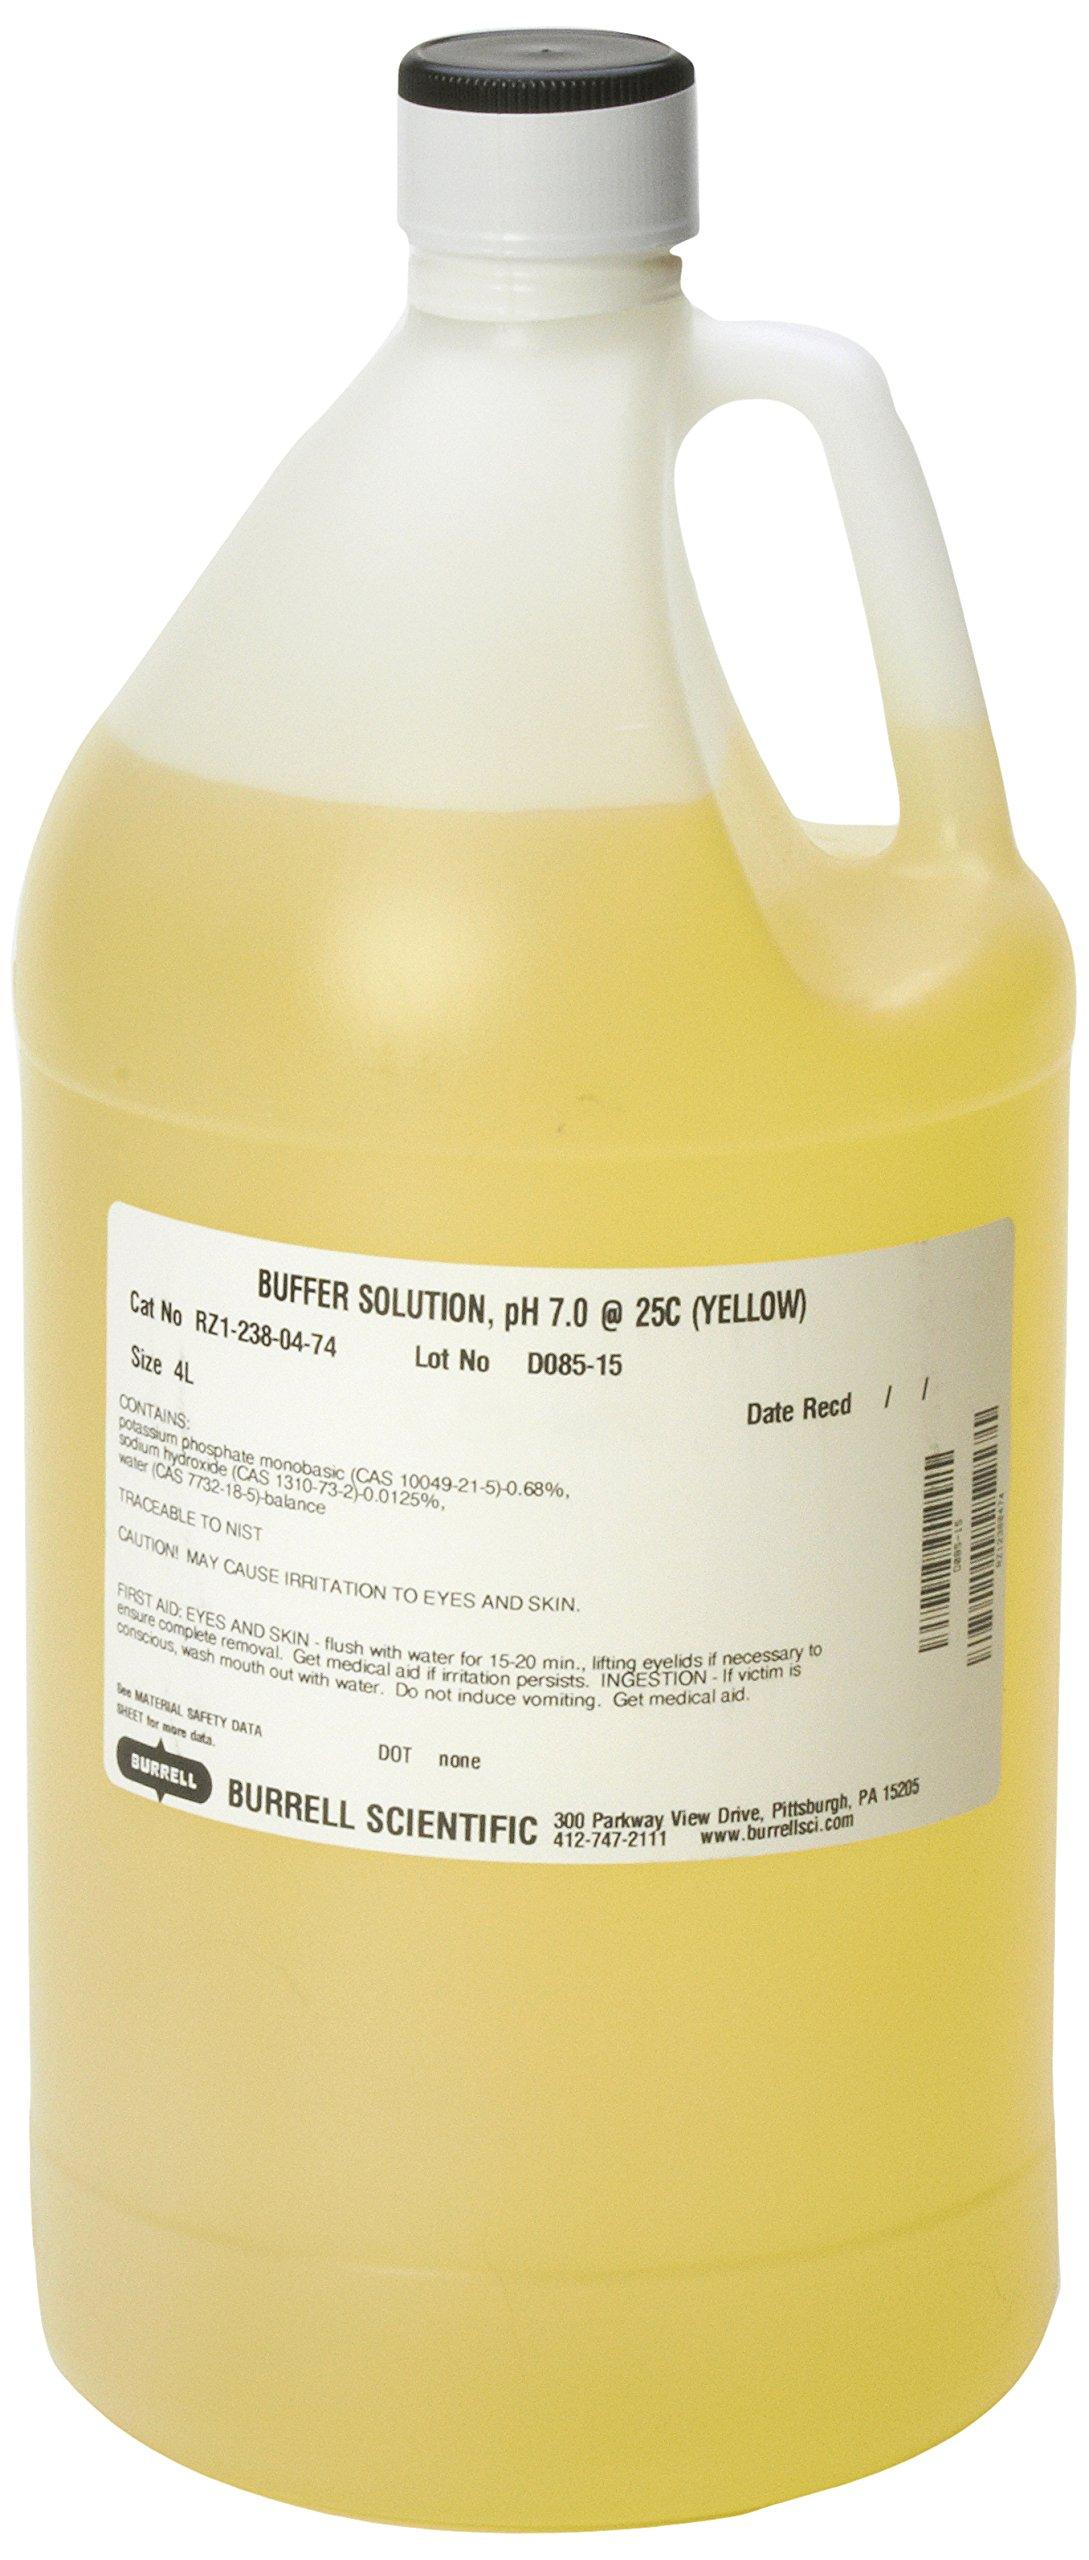 Burrell Scientific RZ1-238-04-74 Buffer Solution, 7.0 pH, 4 L, Yellow